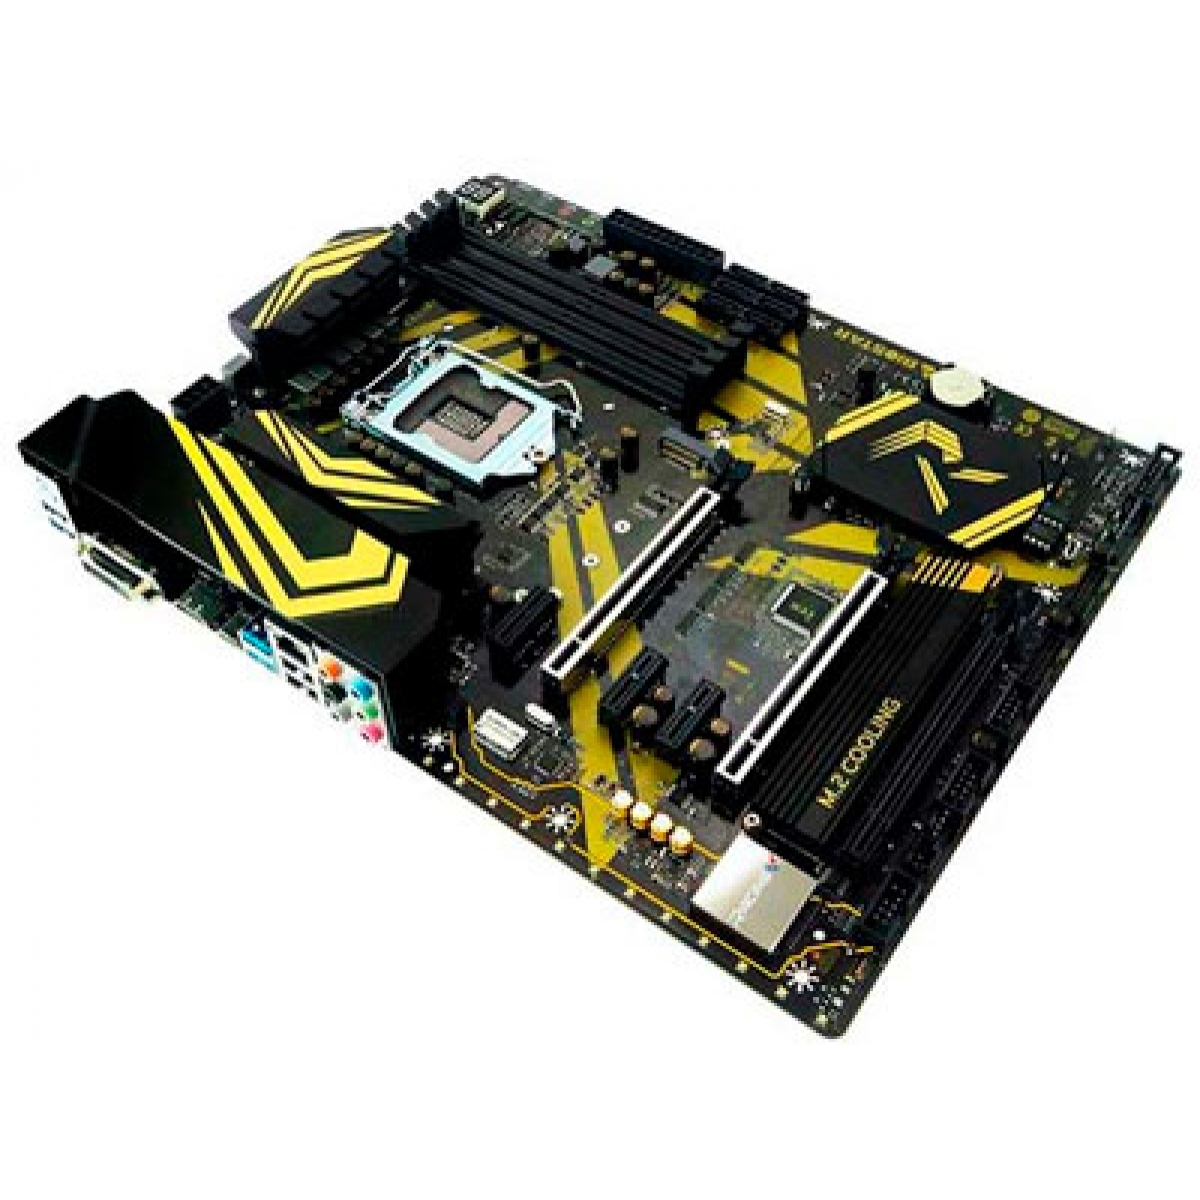 Placa Mãe Biostar Racing Z370GT6 Gaming, Chipset Z370, Intel LGA 1151, ATX, DDR4